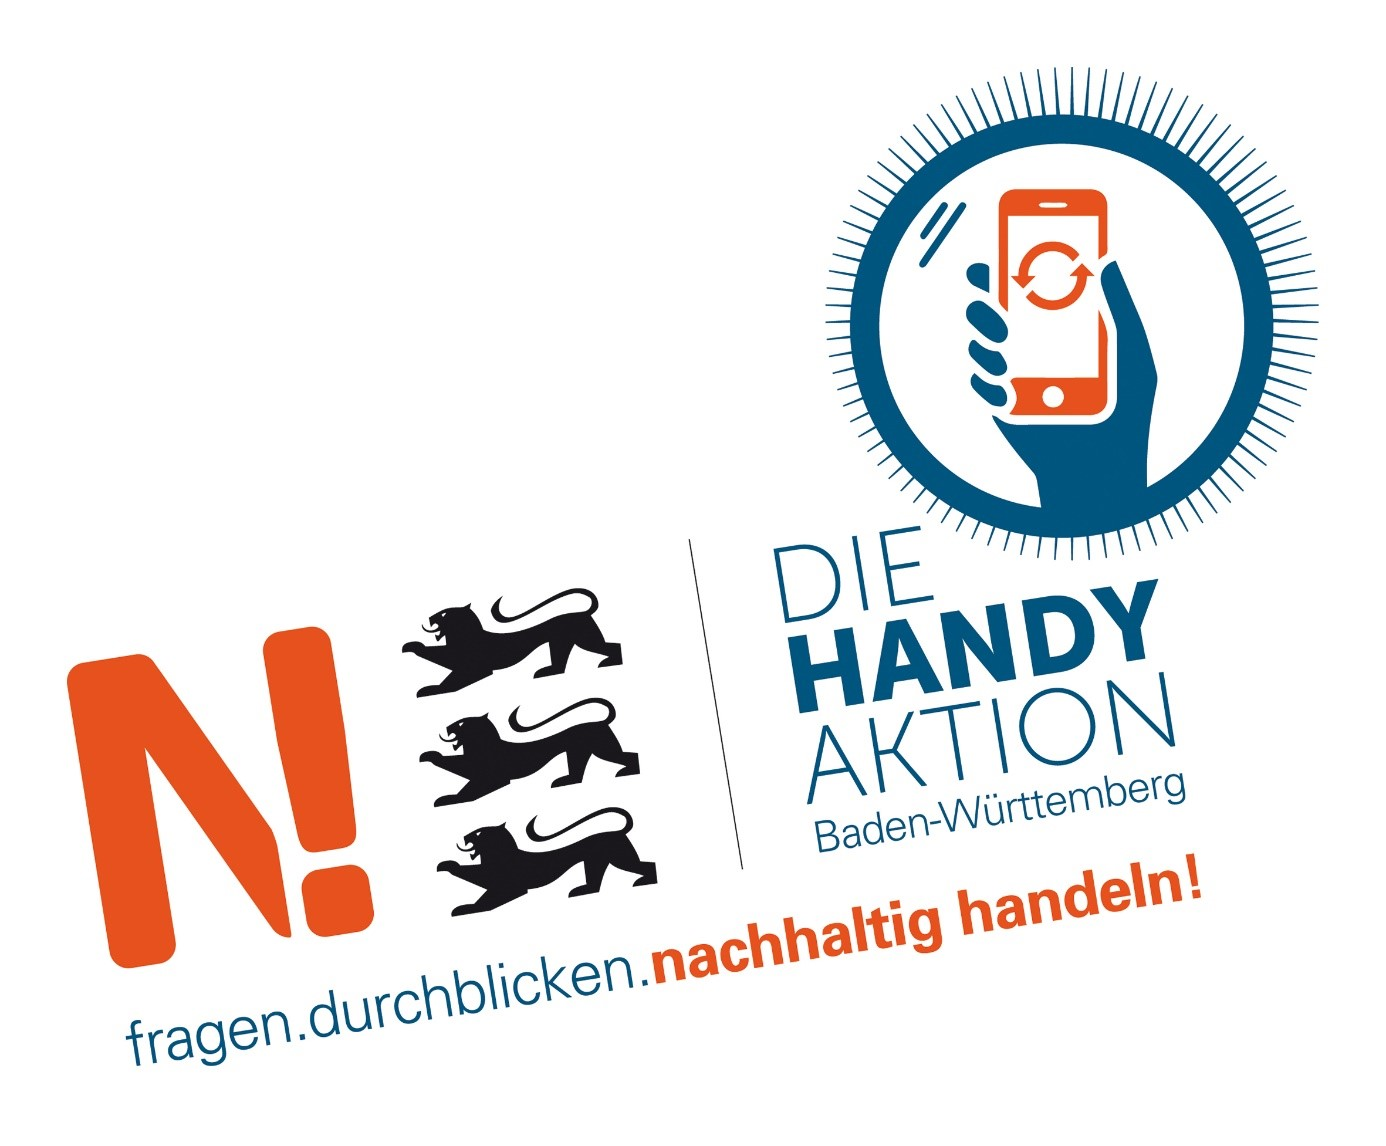 Handyaktion_logo